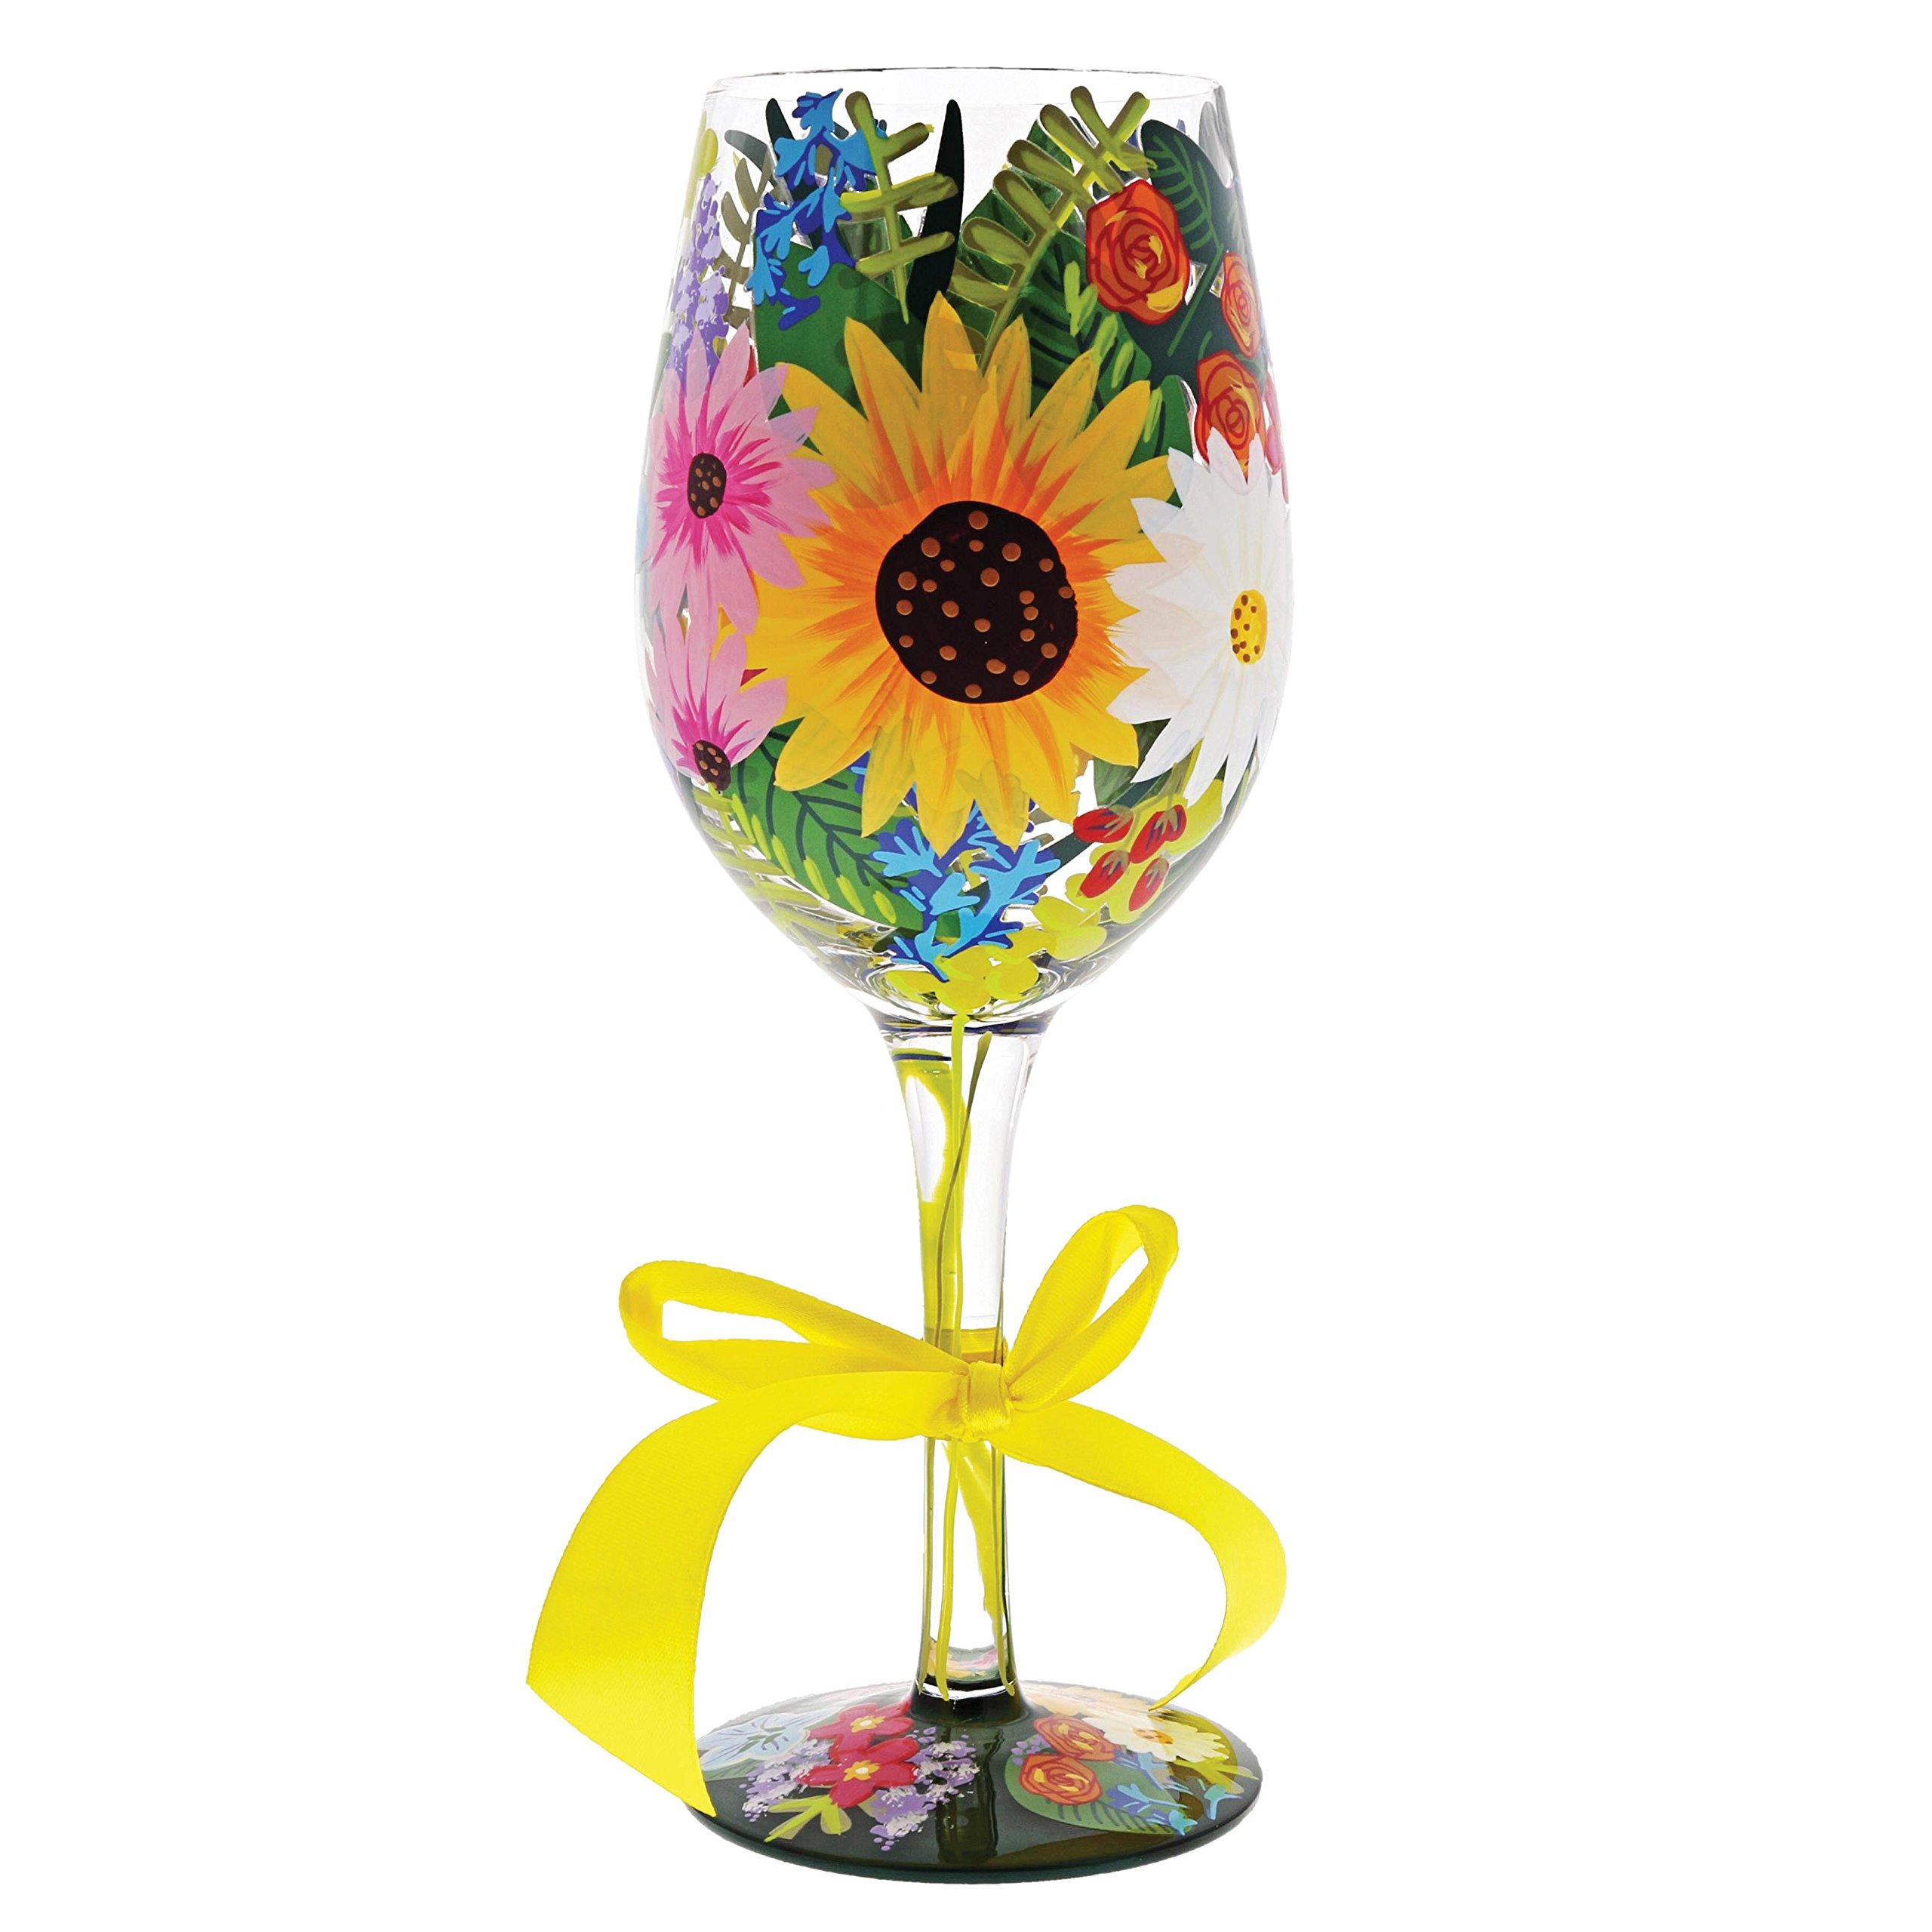 "Designs by Lolita ""Wildflowers"" Hand-painted Artisan Wine Glass, 15 oz. by Santa Barbara Design Studio (Image #1)"